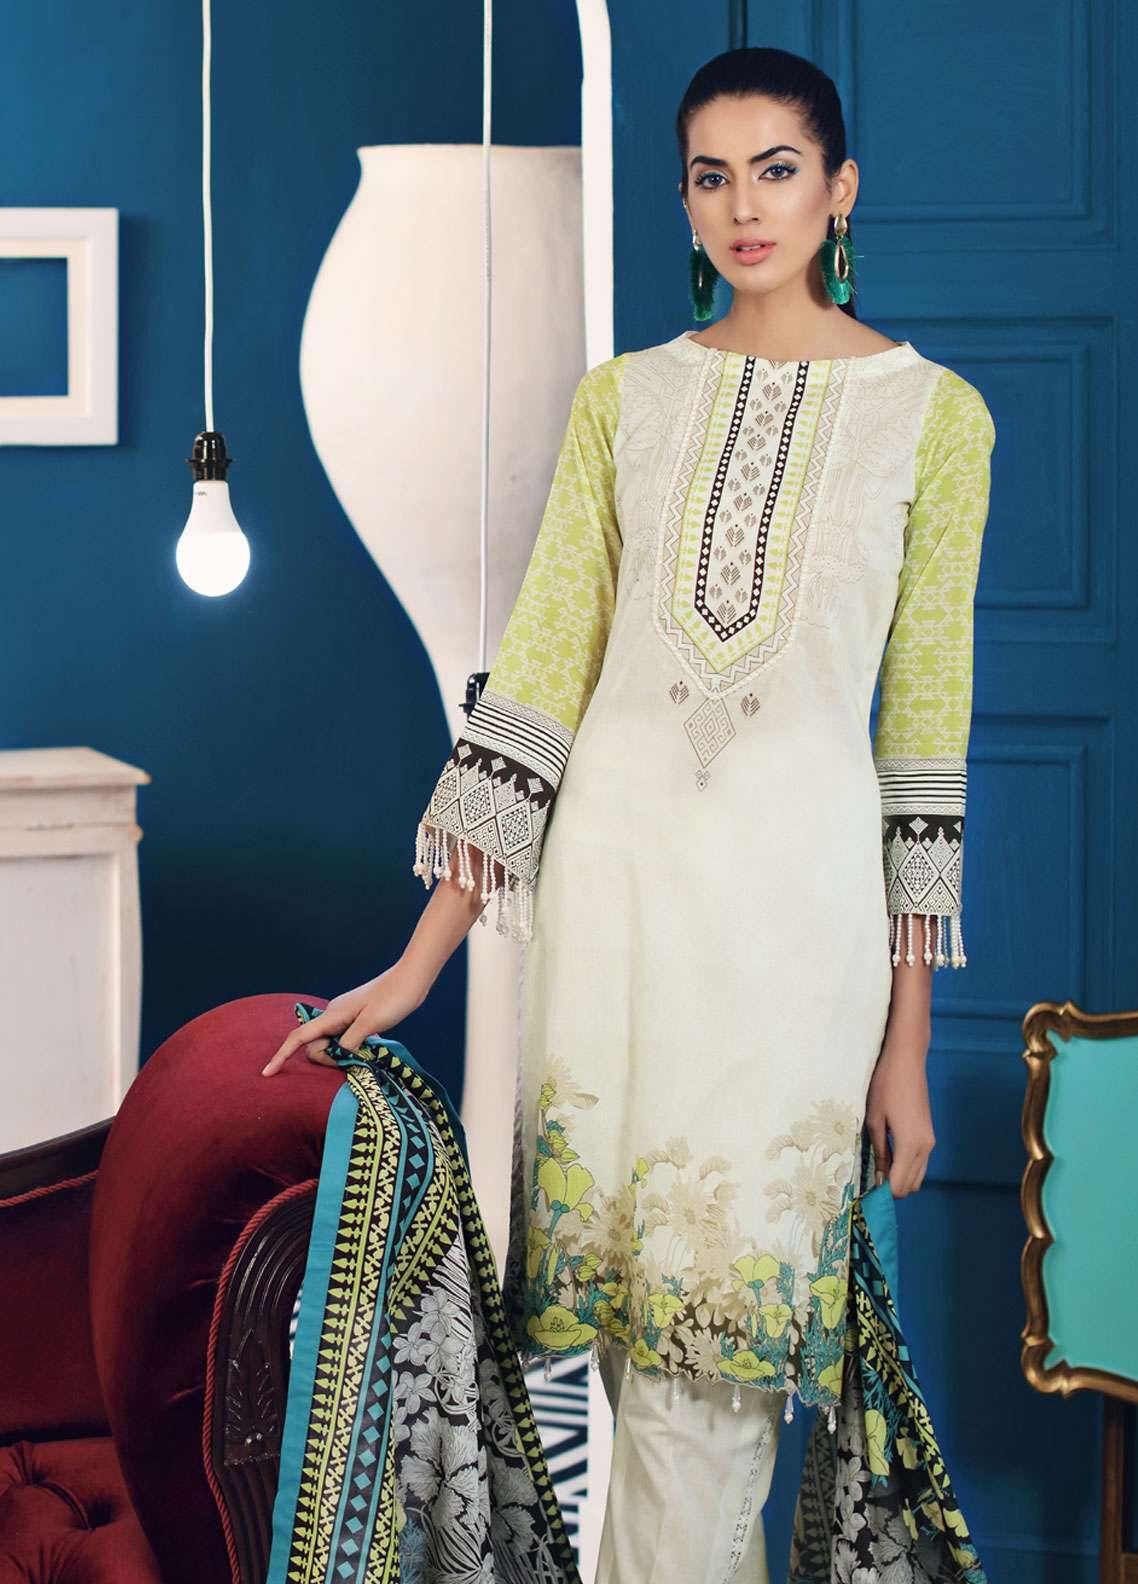 Al Zohaib Printed Lawn Unstitched 3 Piece Suit AZ19SA PS-14B - Spring / Summer Collection